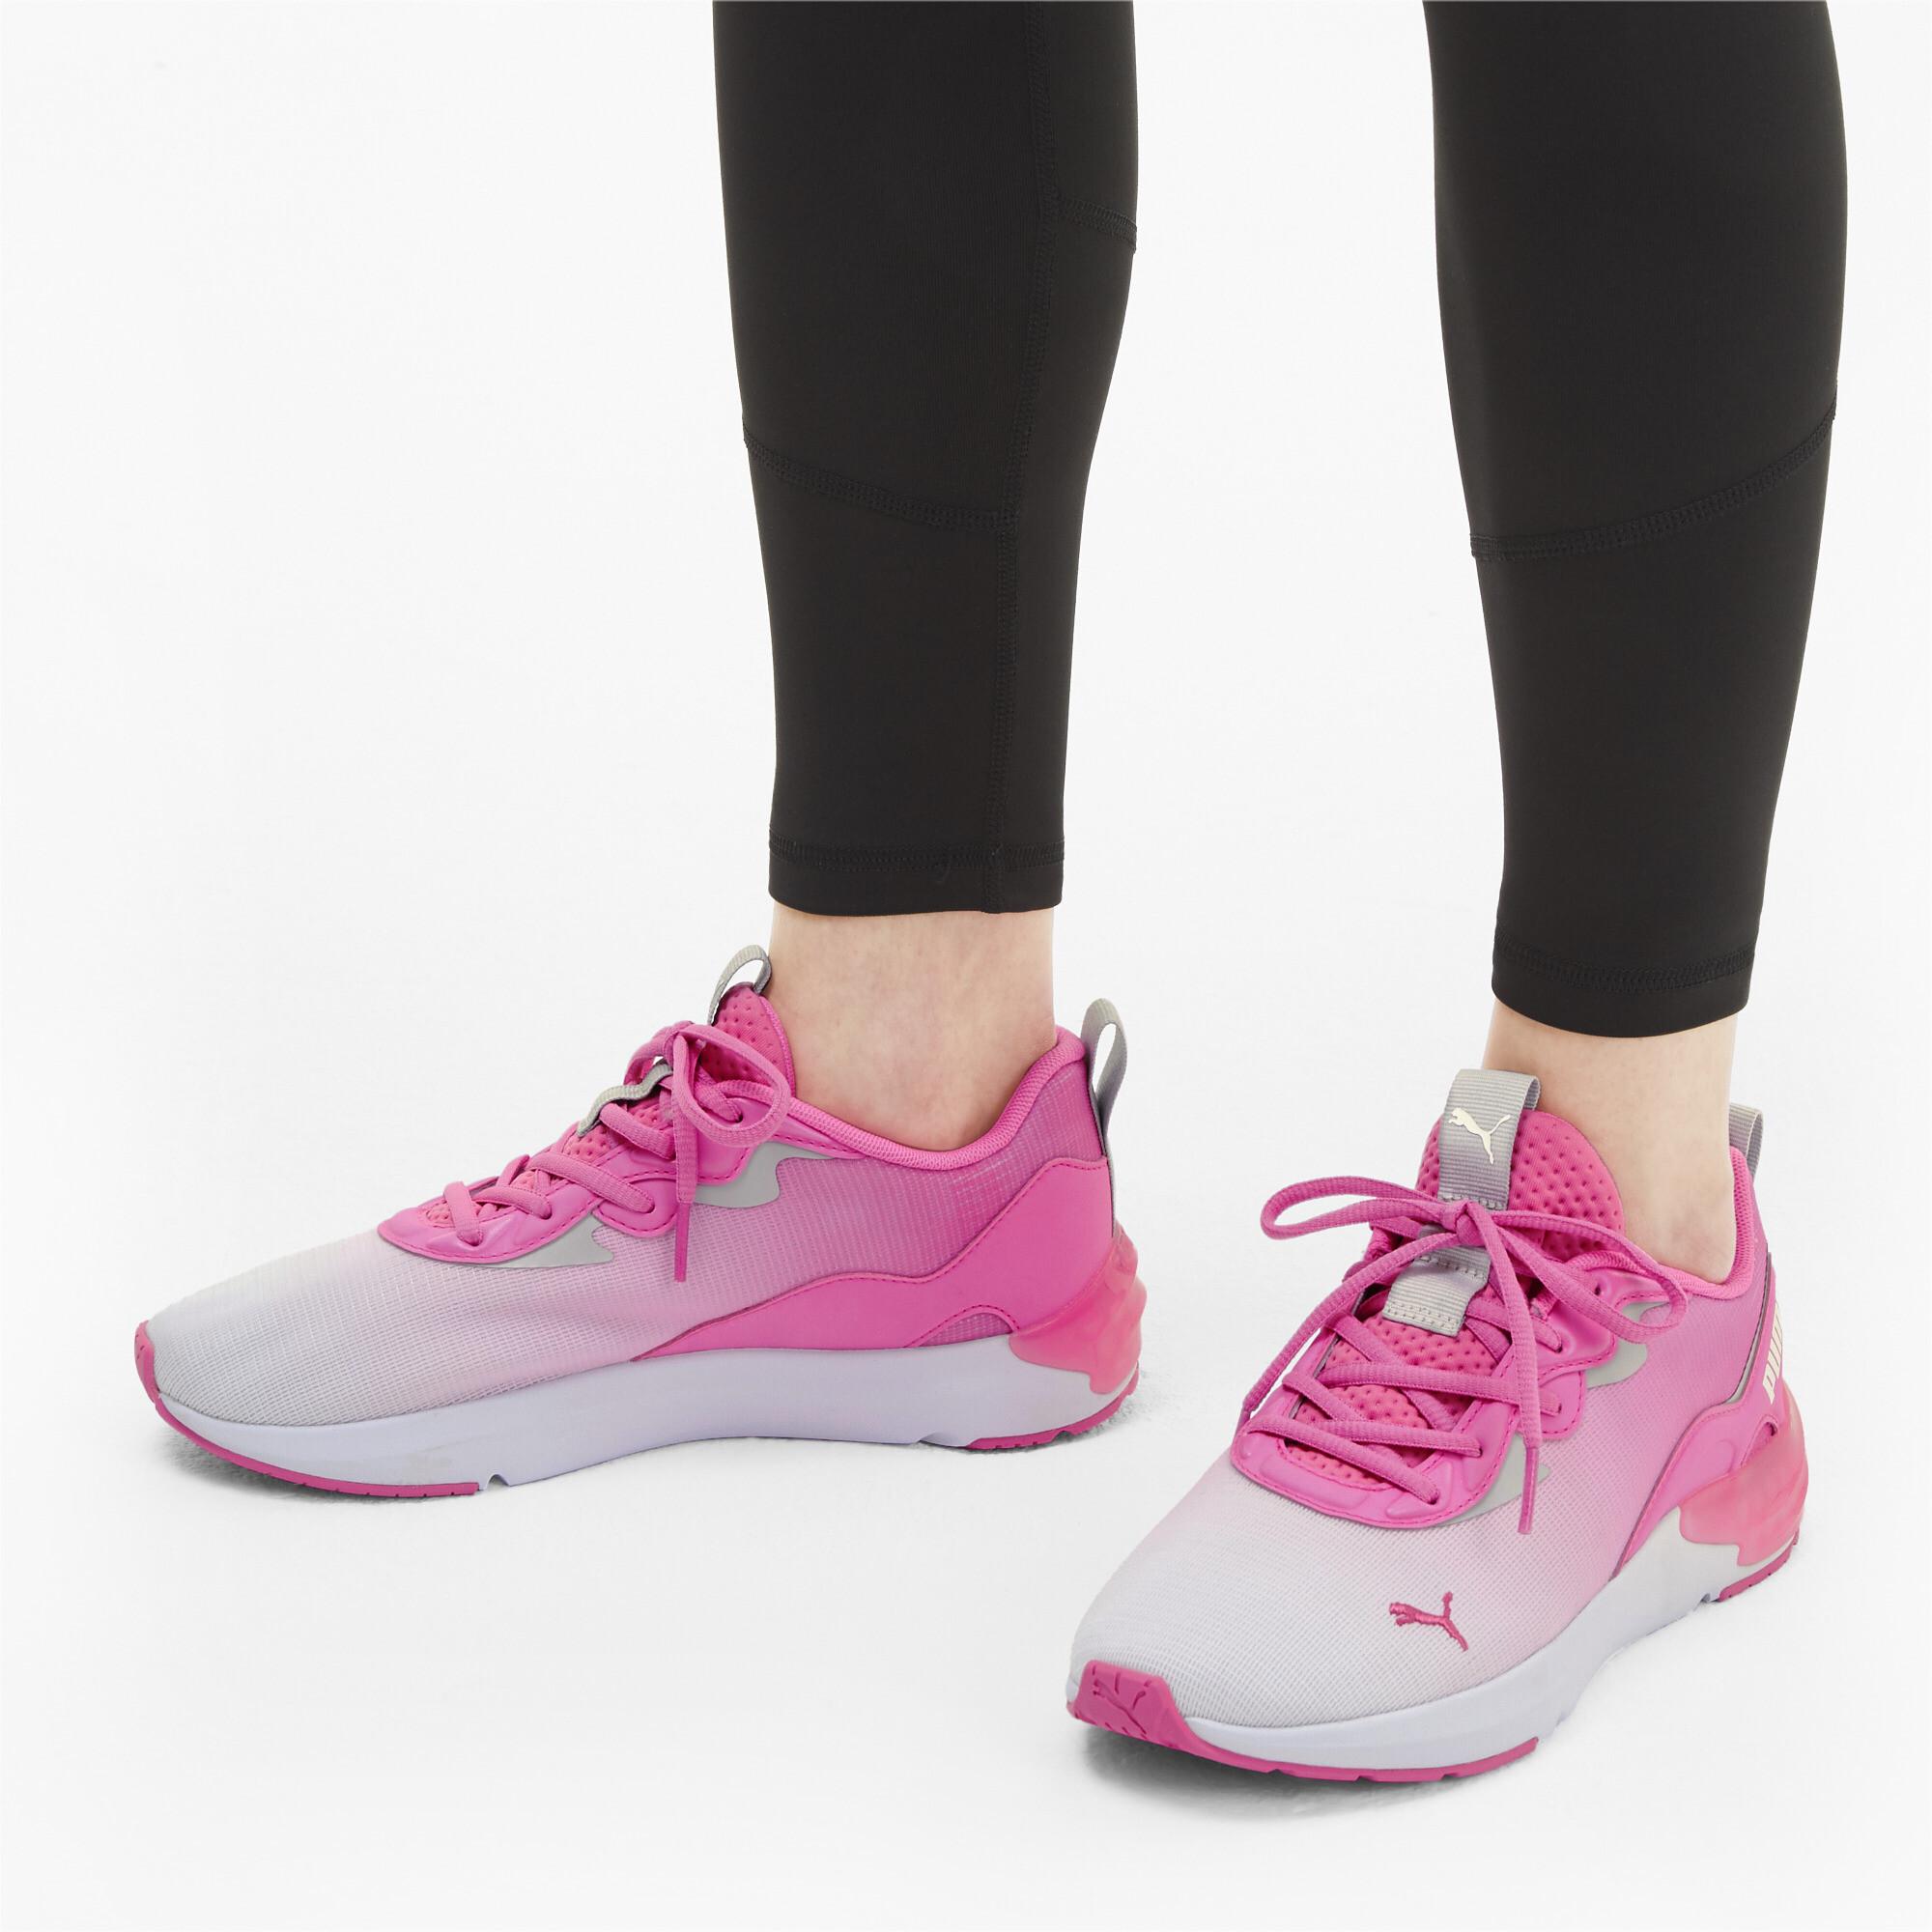 PUMA-Women-039-s-CELL-Initiate-Fade-Training-Shoes thumbnail 5